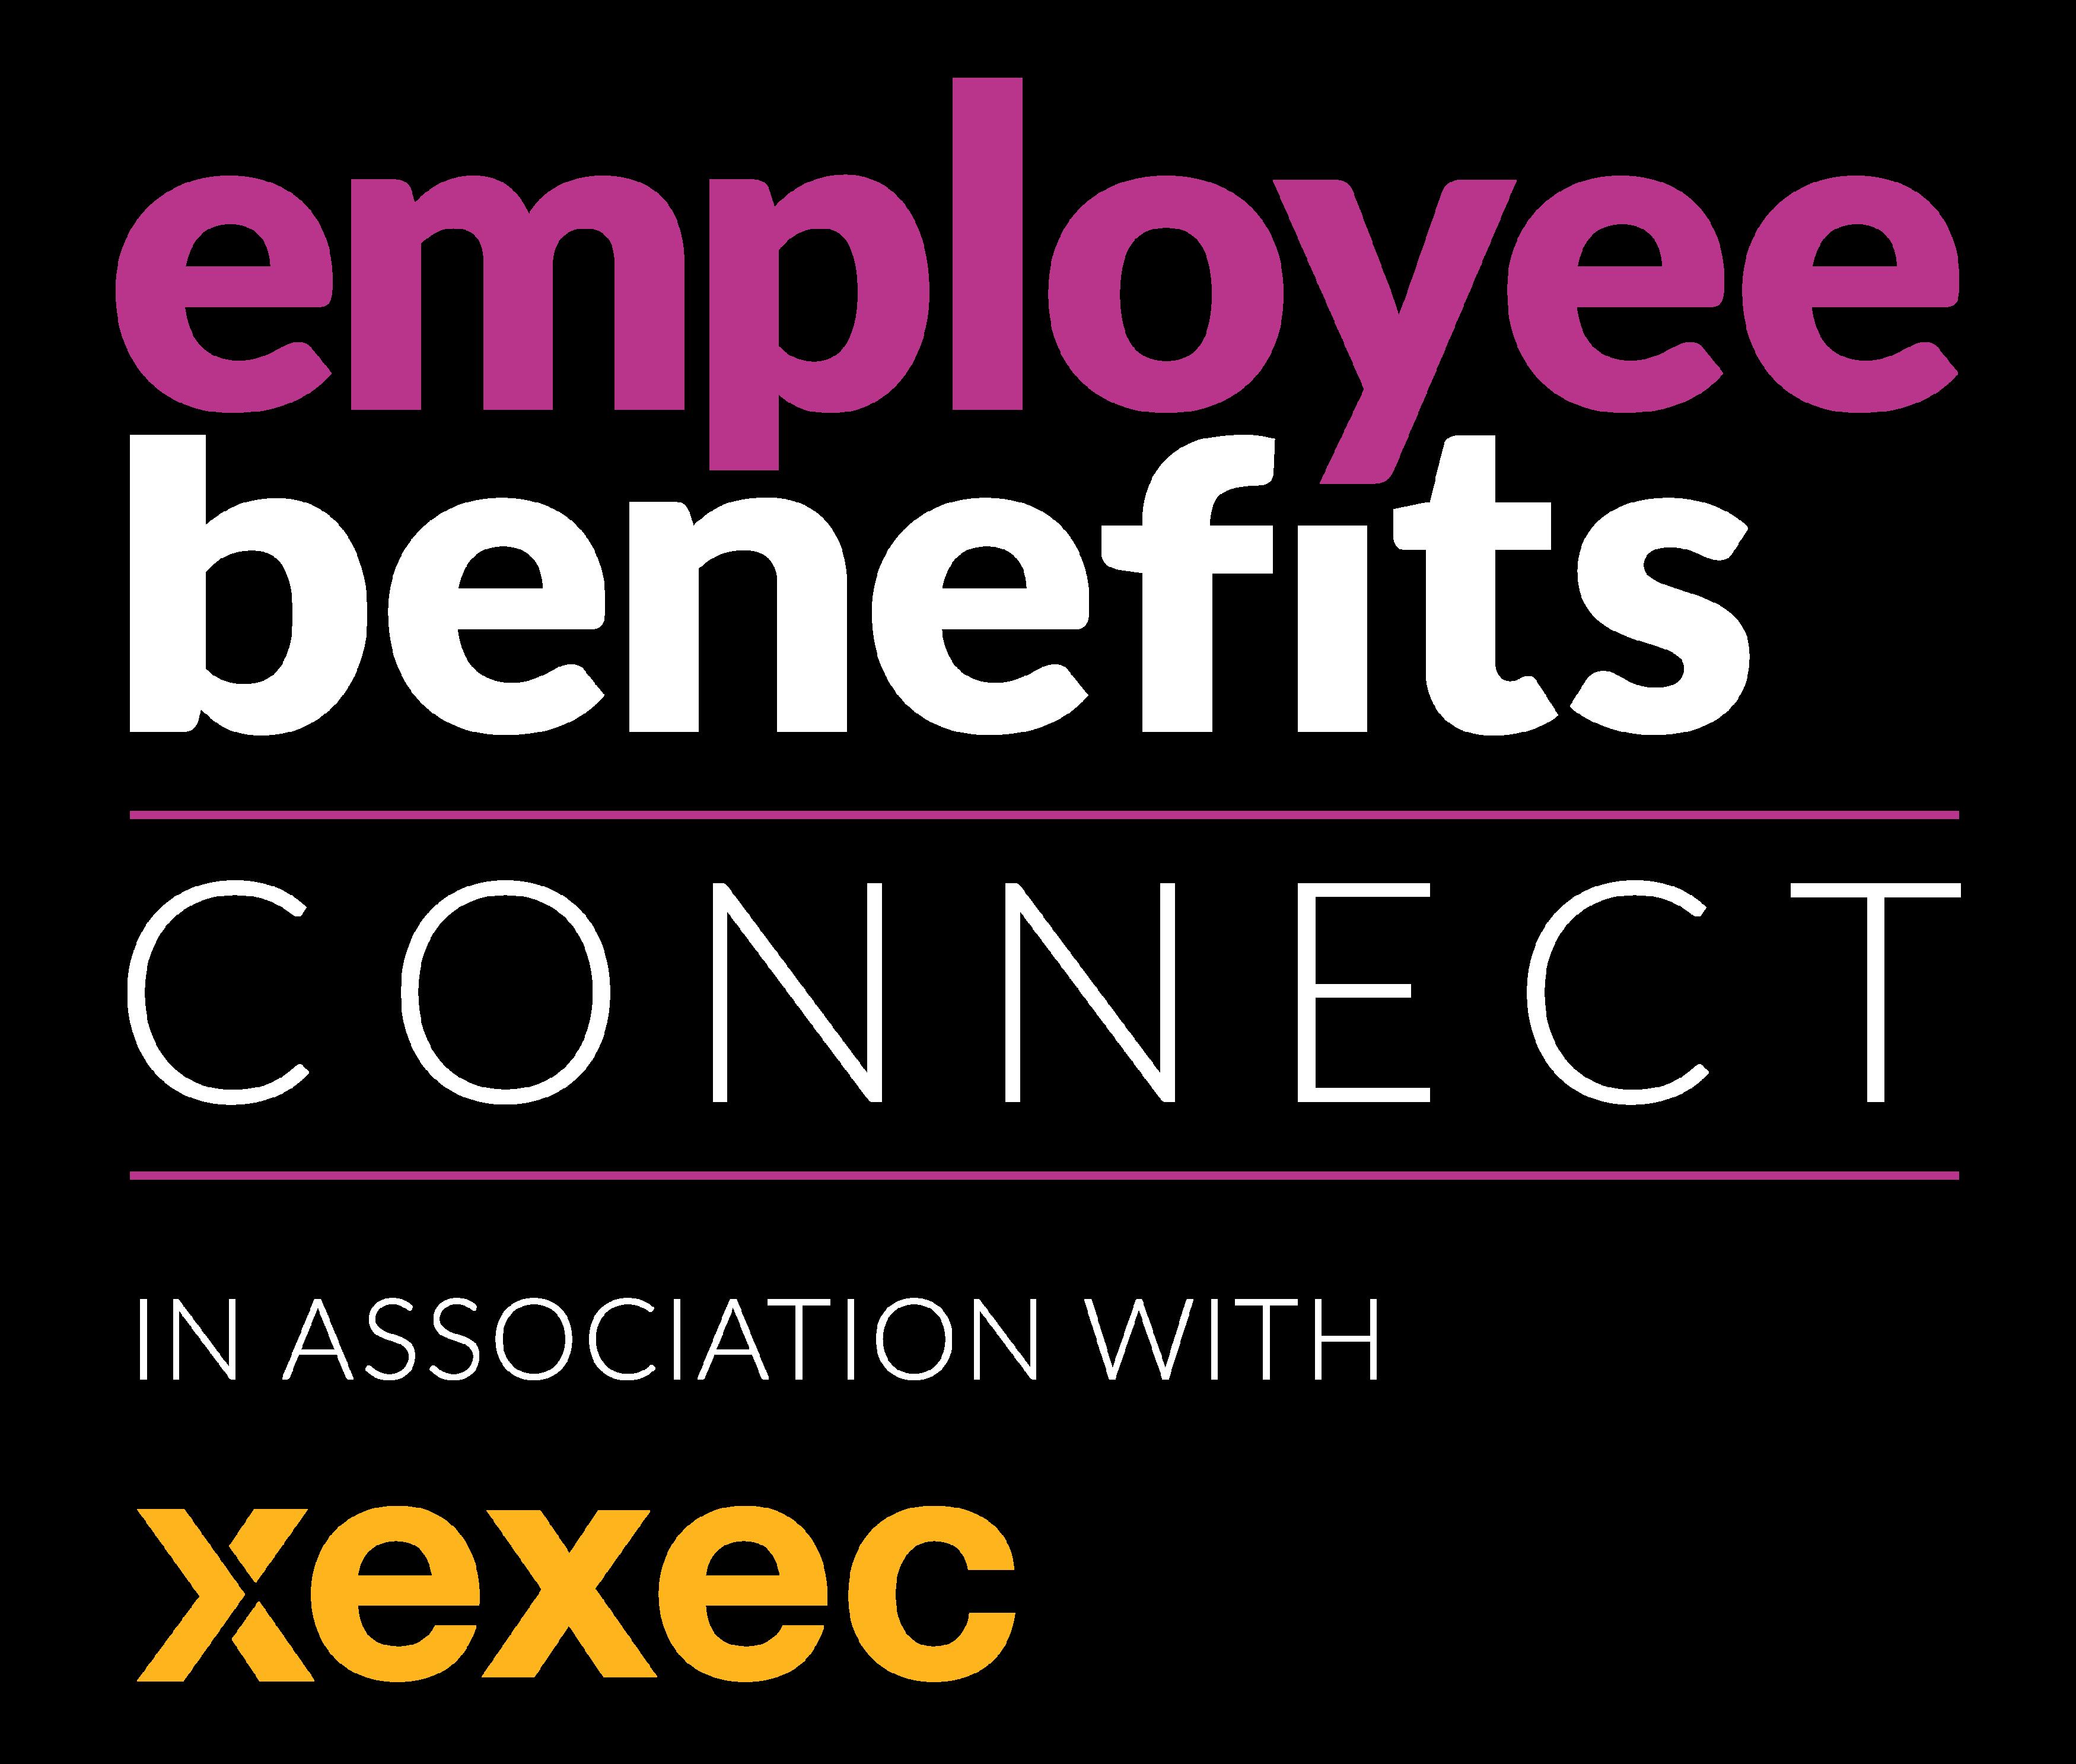 employee benefits connect logo